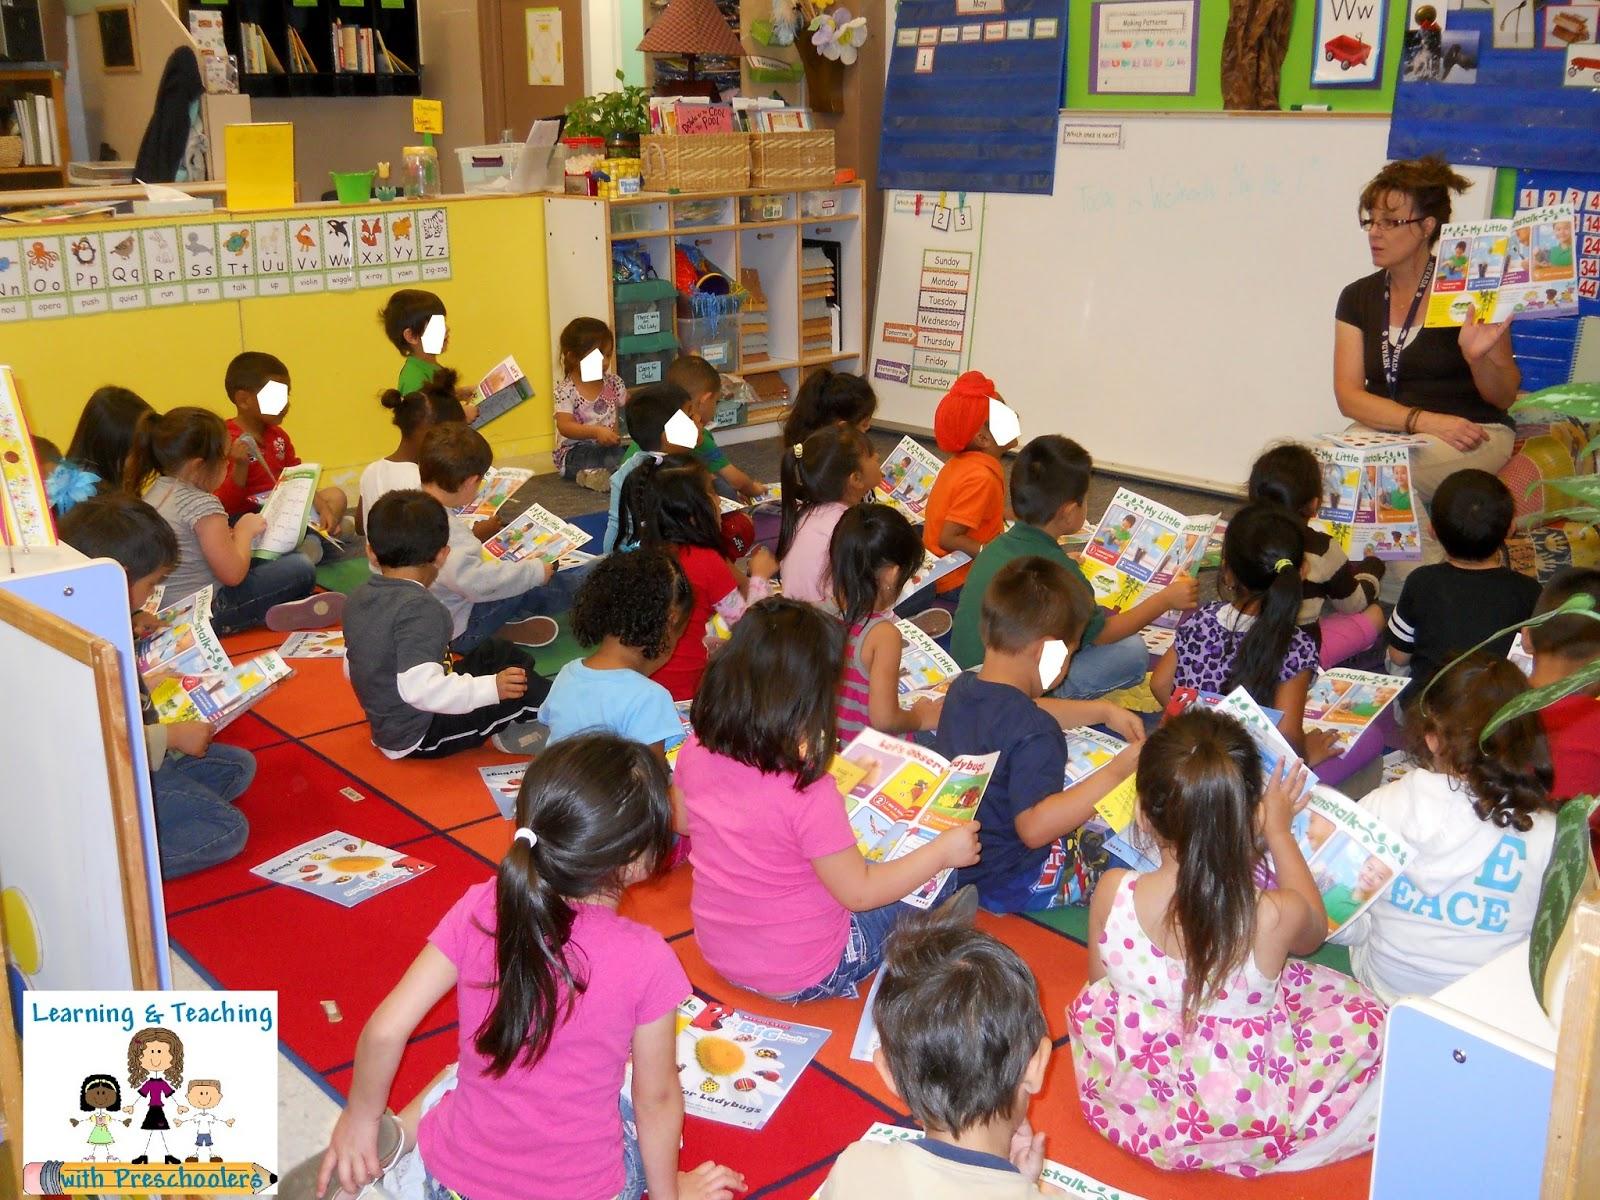 children discussion images - photo #12